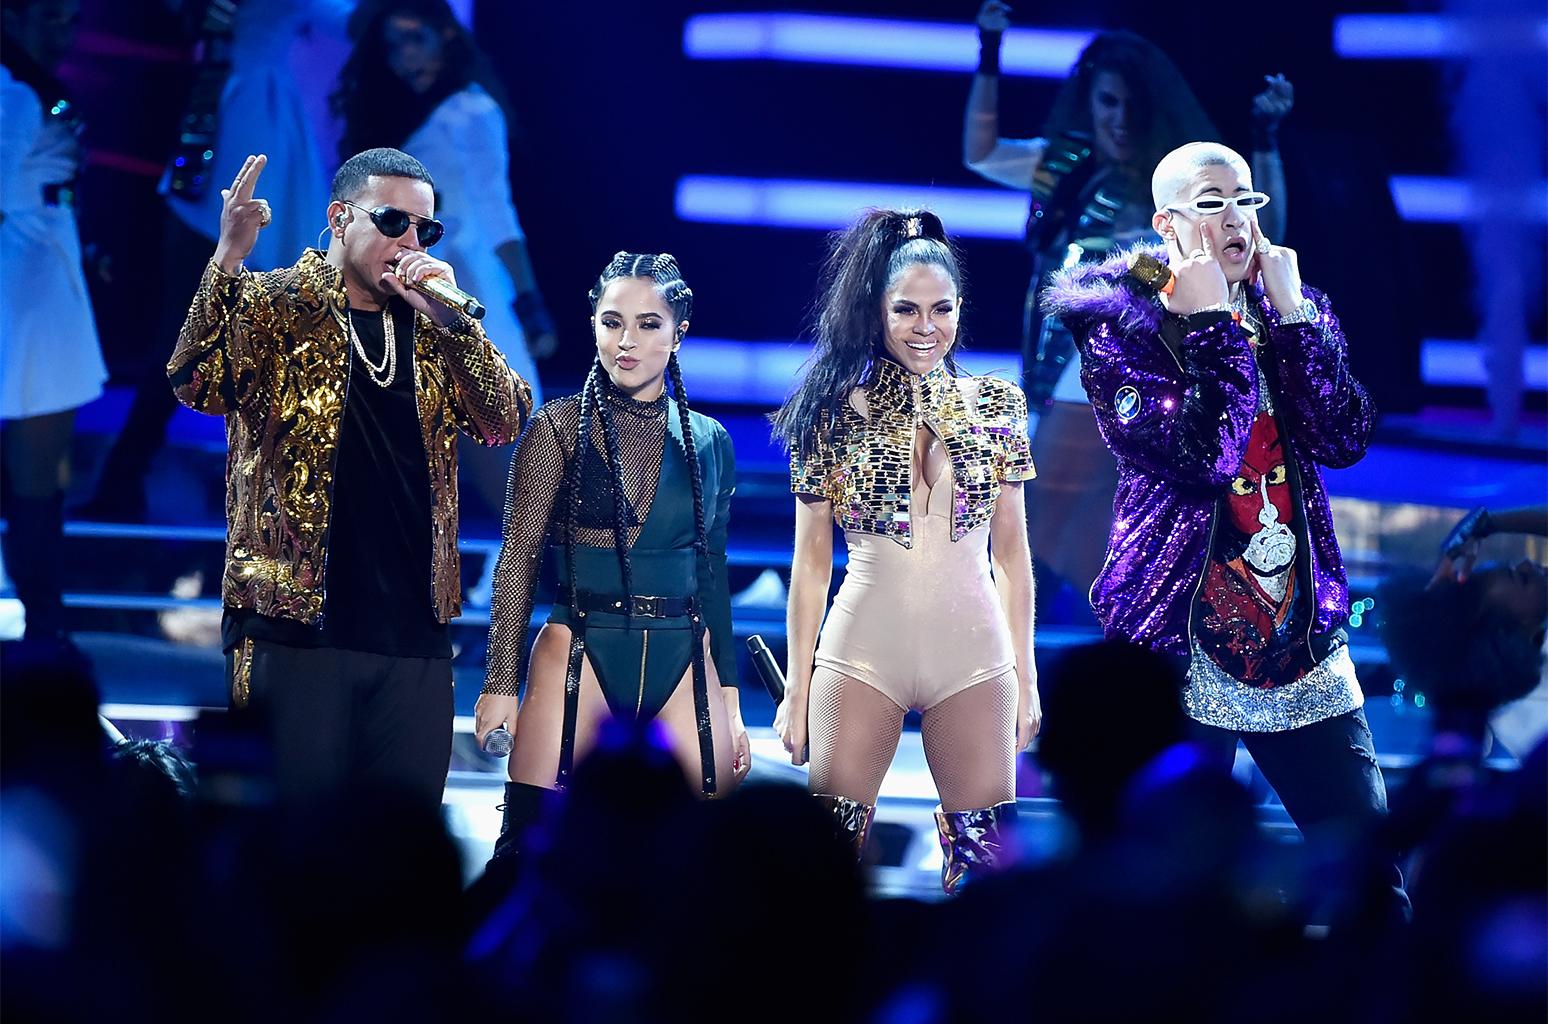 Amazing performanceby Natti Natashain CD Greene outfit atthe Latin Billboards 2018withDaddy Yankee, Becky G and Bad Bunny styled byOscar Montesdeoca